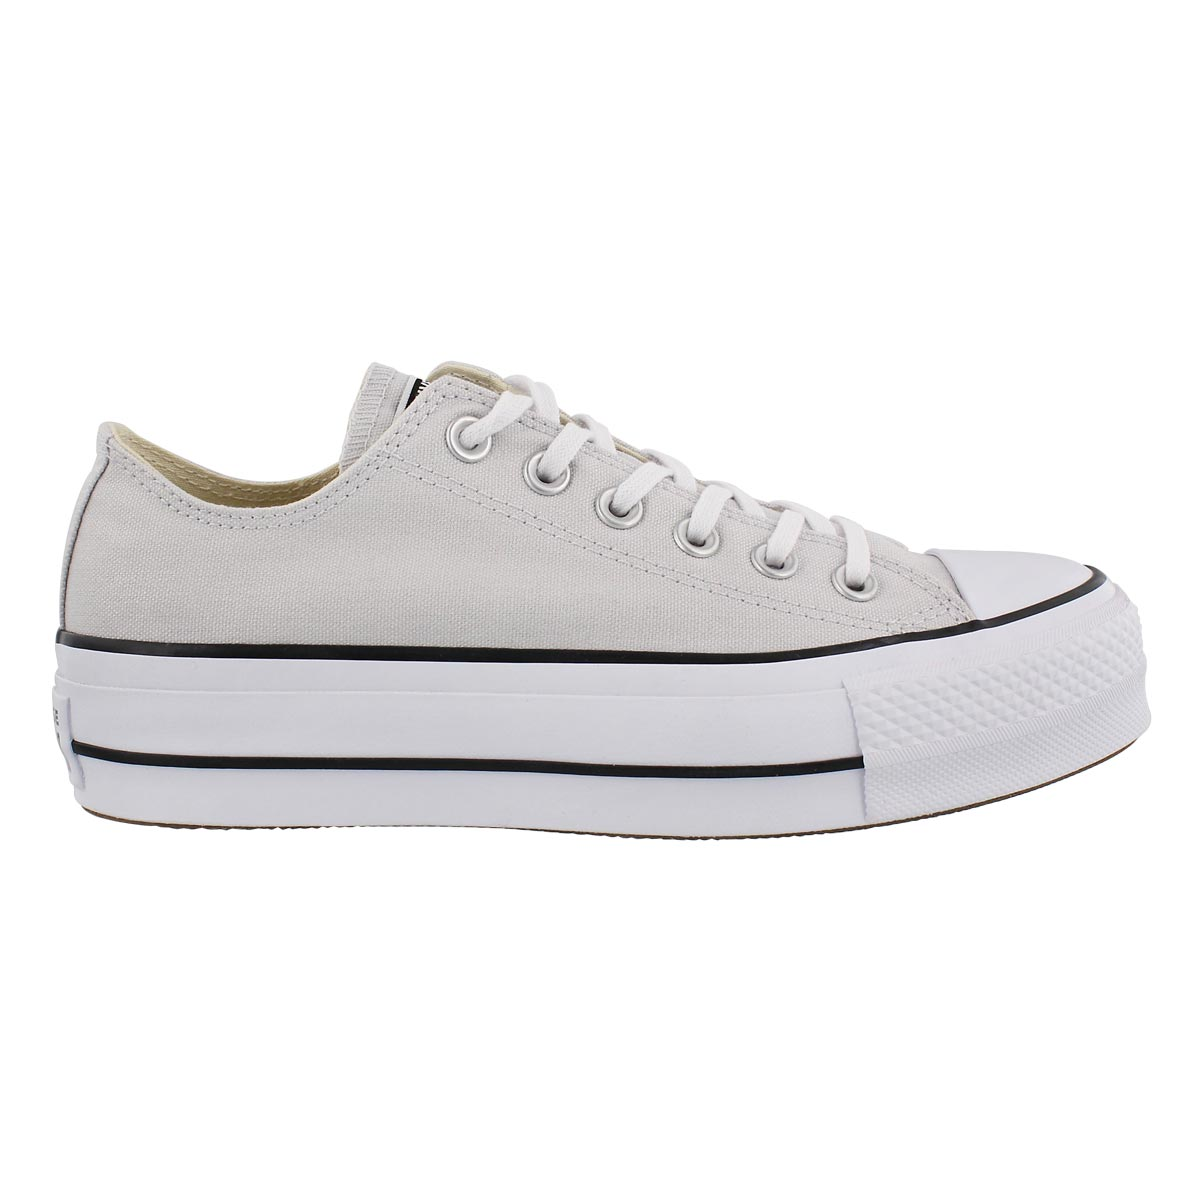 Lds CT A/S Lift mouse/black sneaker